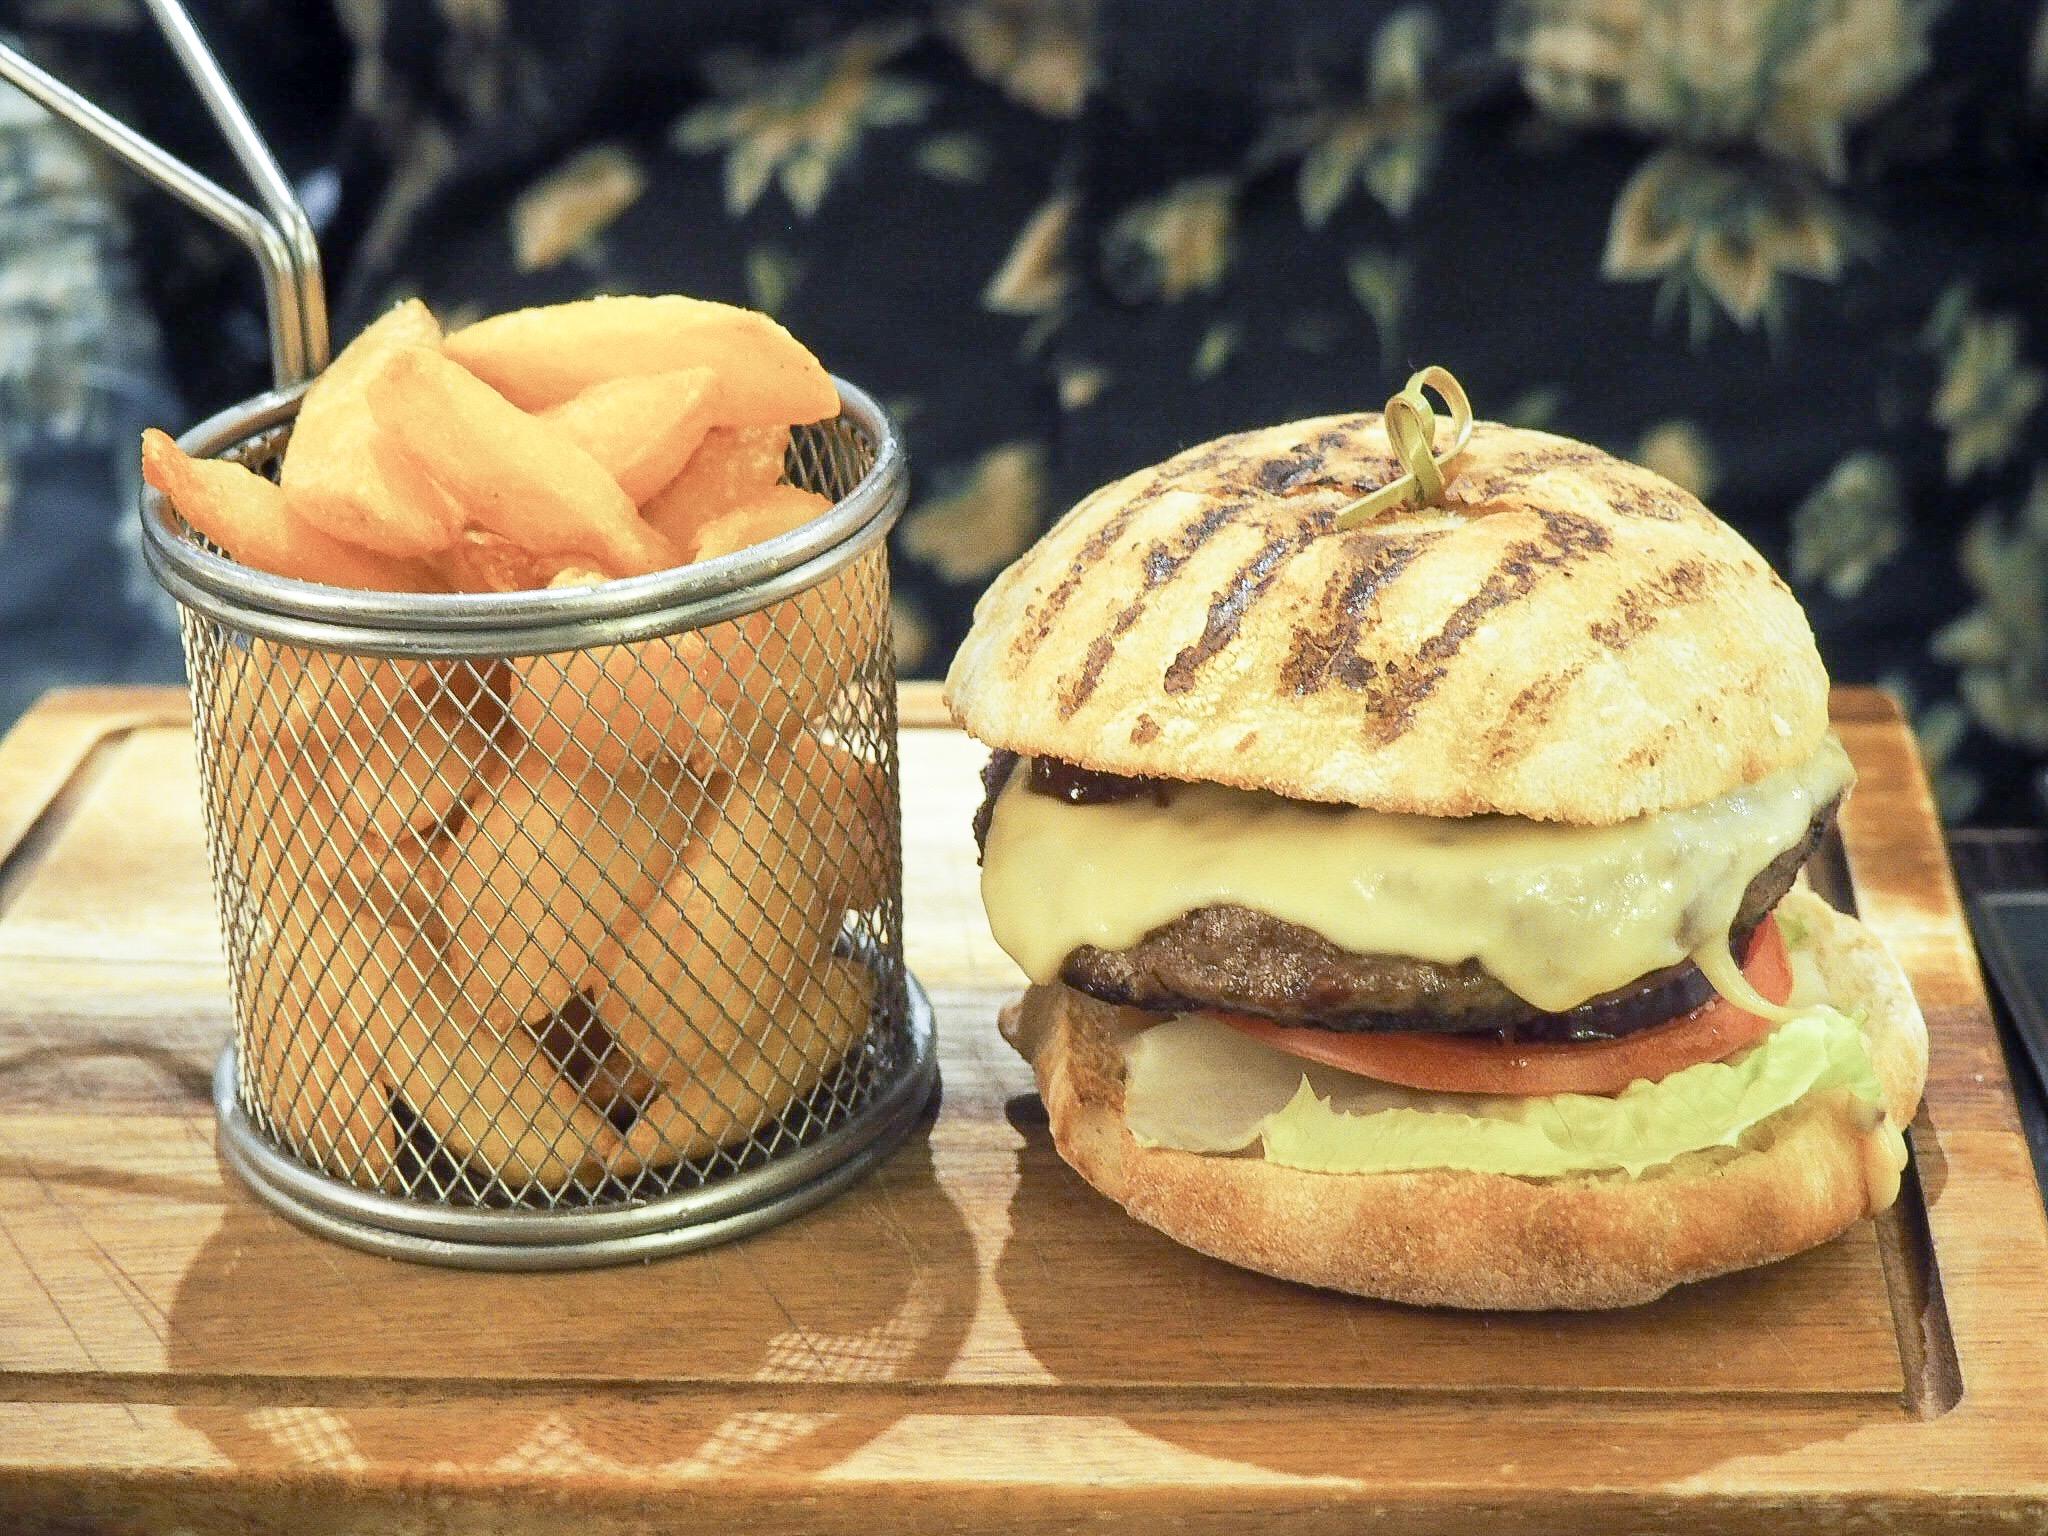 Crowne Plaza Resort Colchester steak burger